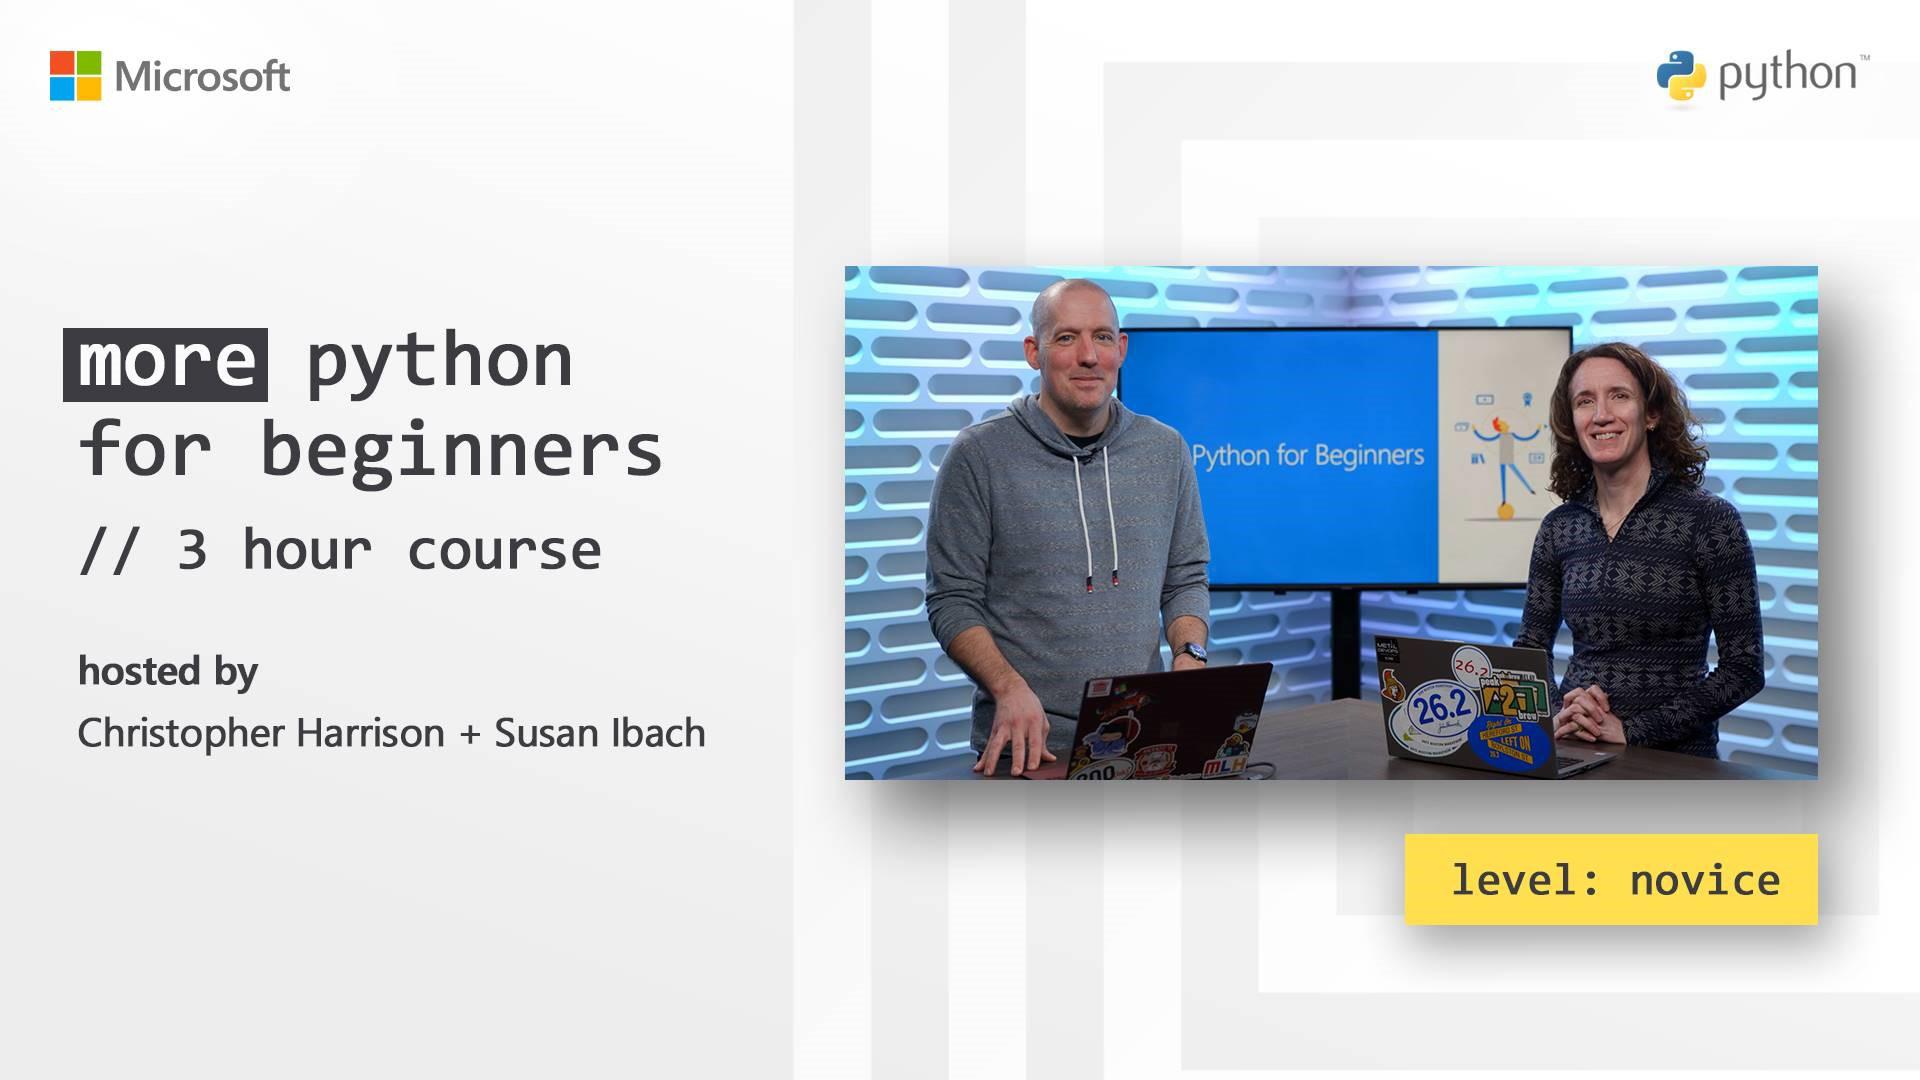 Python class promotion